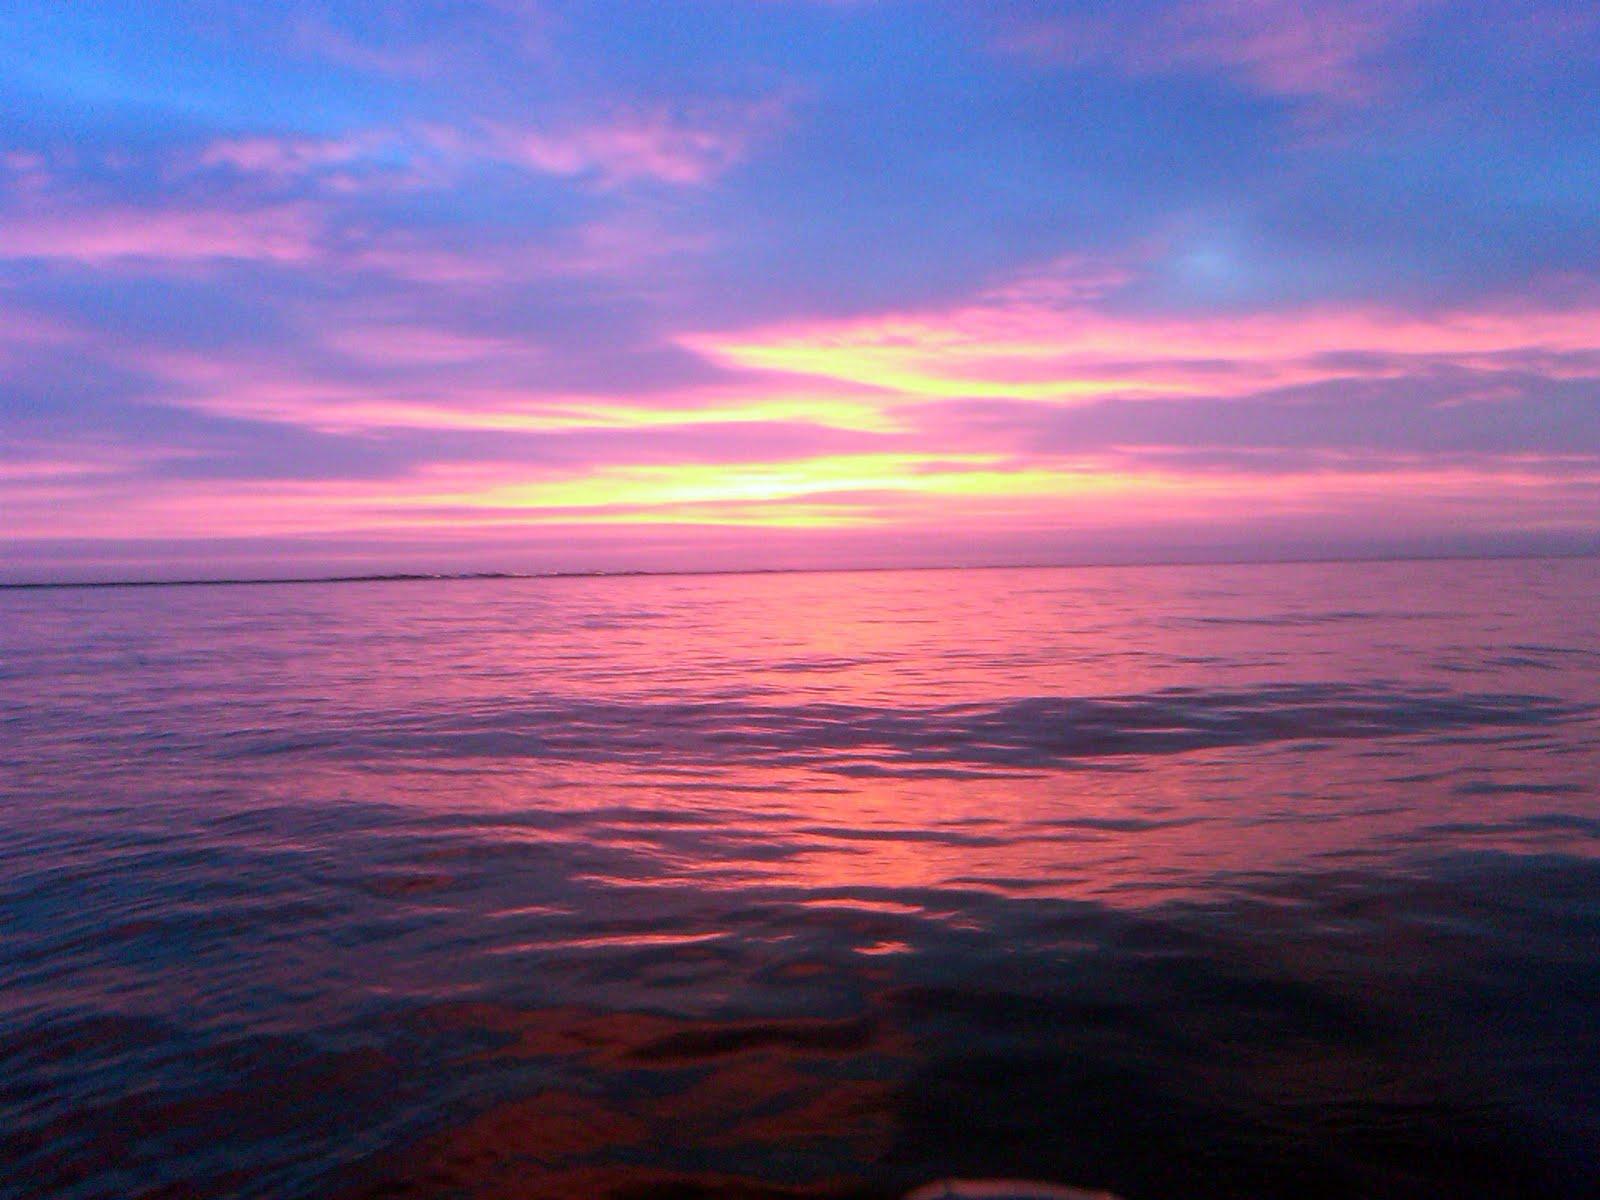 http://2.bp.blogspot.com/-SL_Us5crR6k/Td_rWoly3SI/AAAAAAAAAMo/kVOVOUyBVLM/s1600/sunrise+%25282%2529.jpg